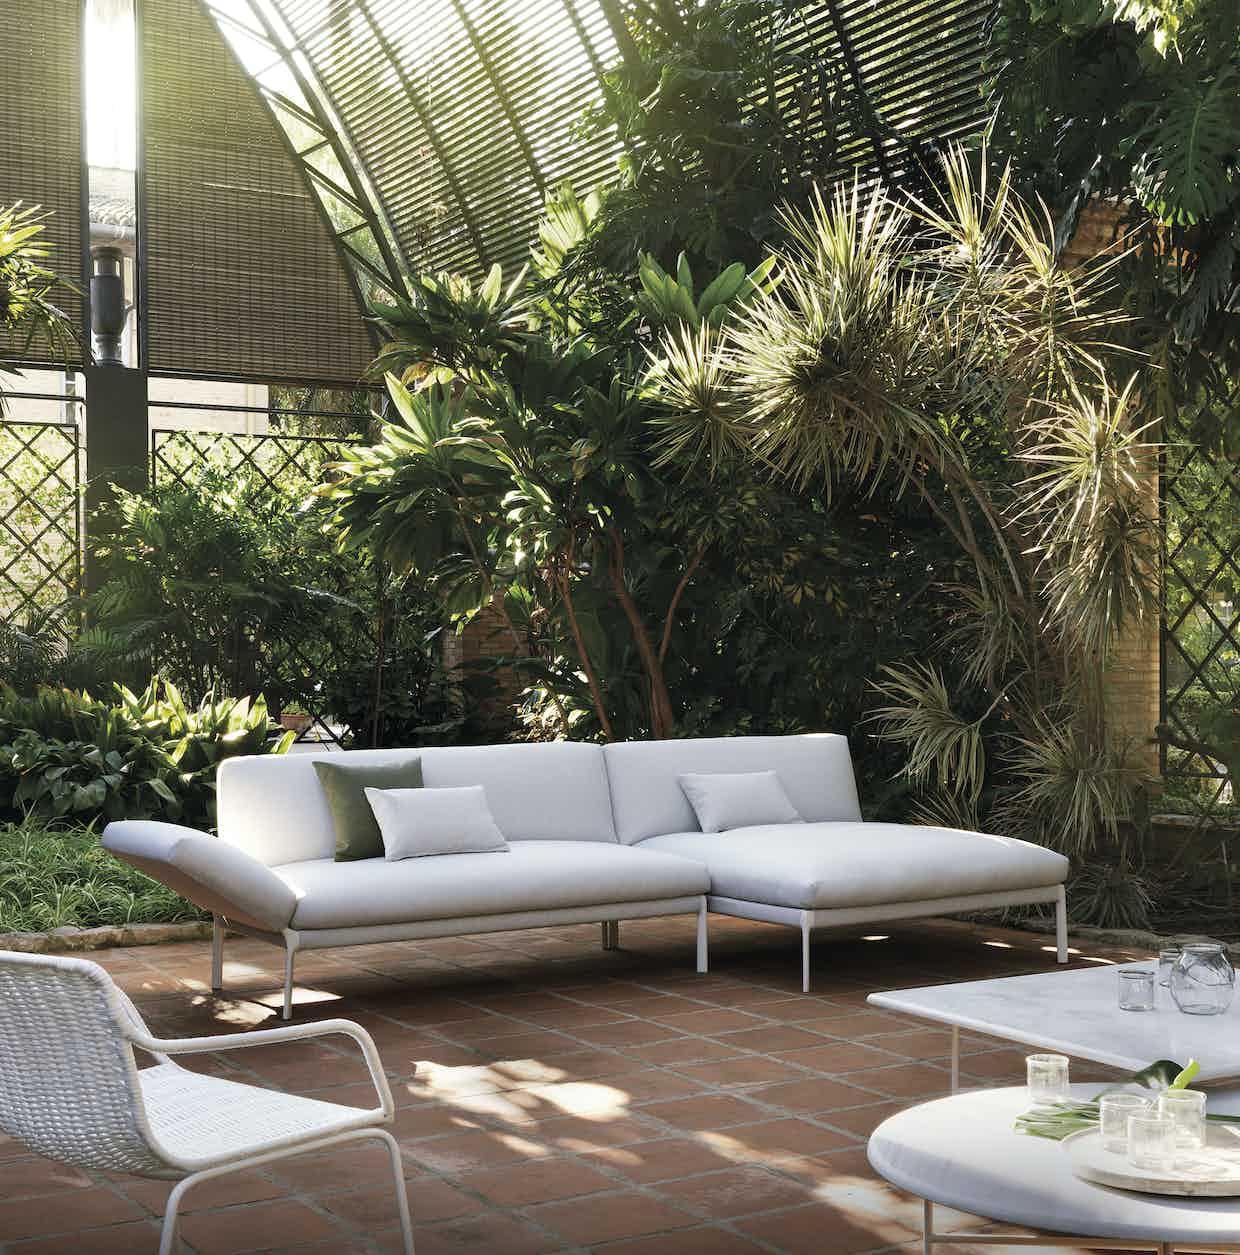 Livit Sofa By Expormim At Haute Living